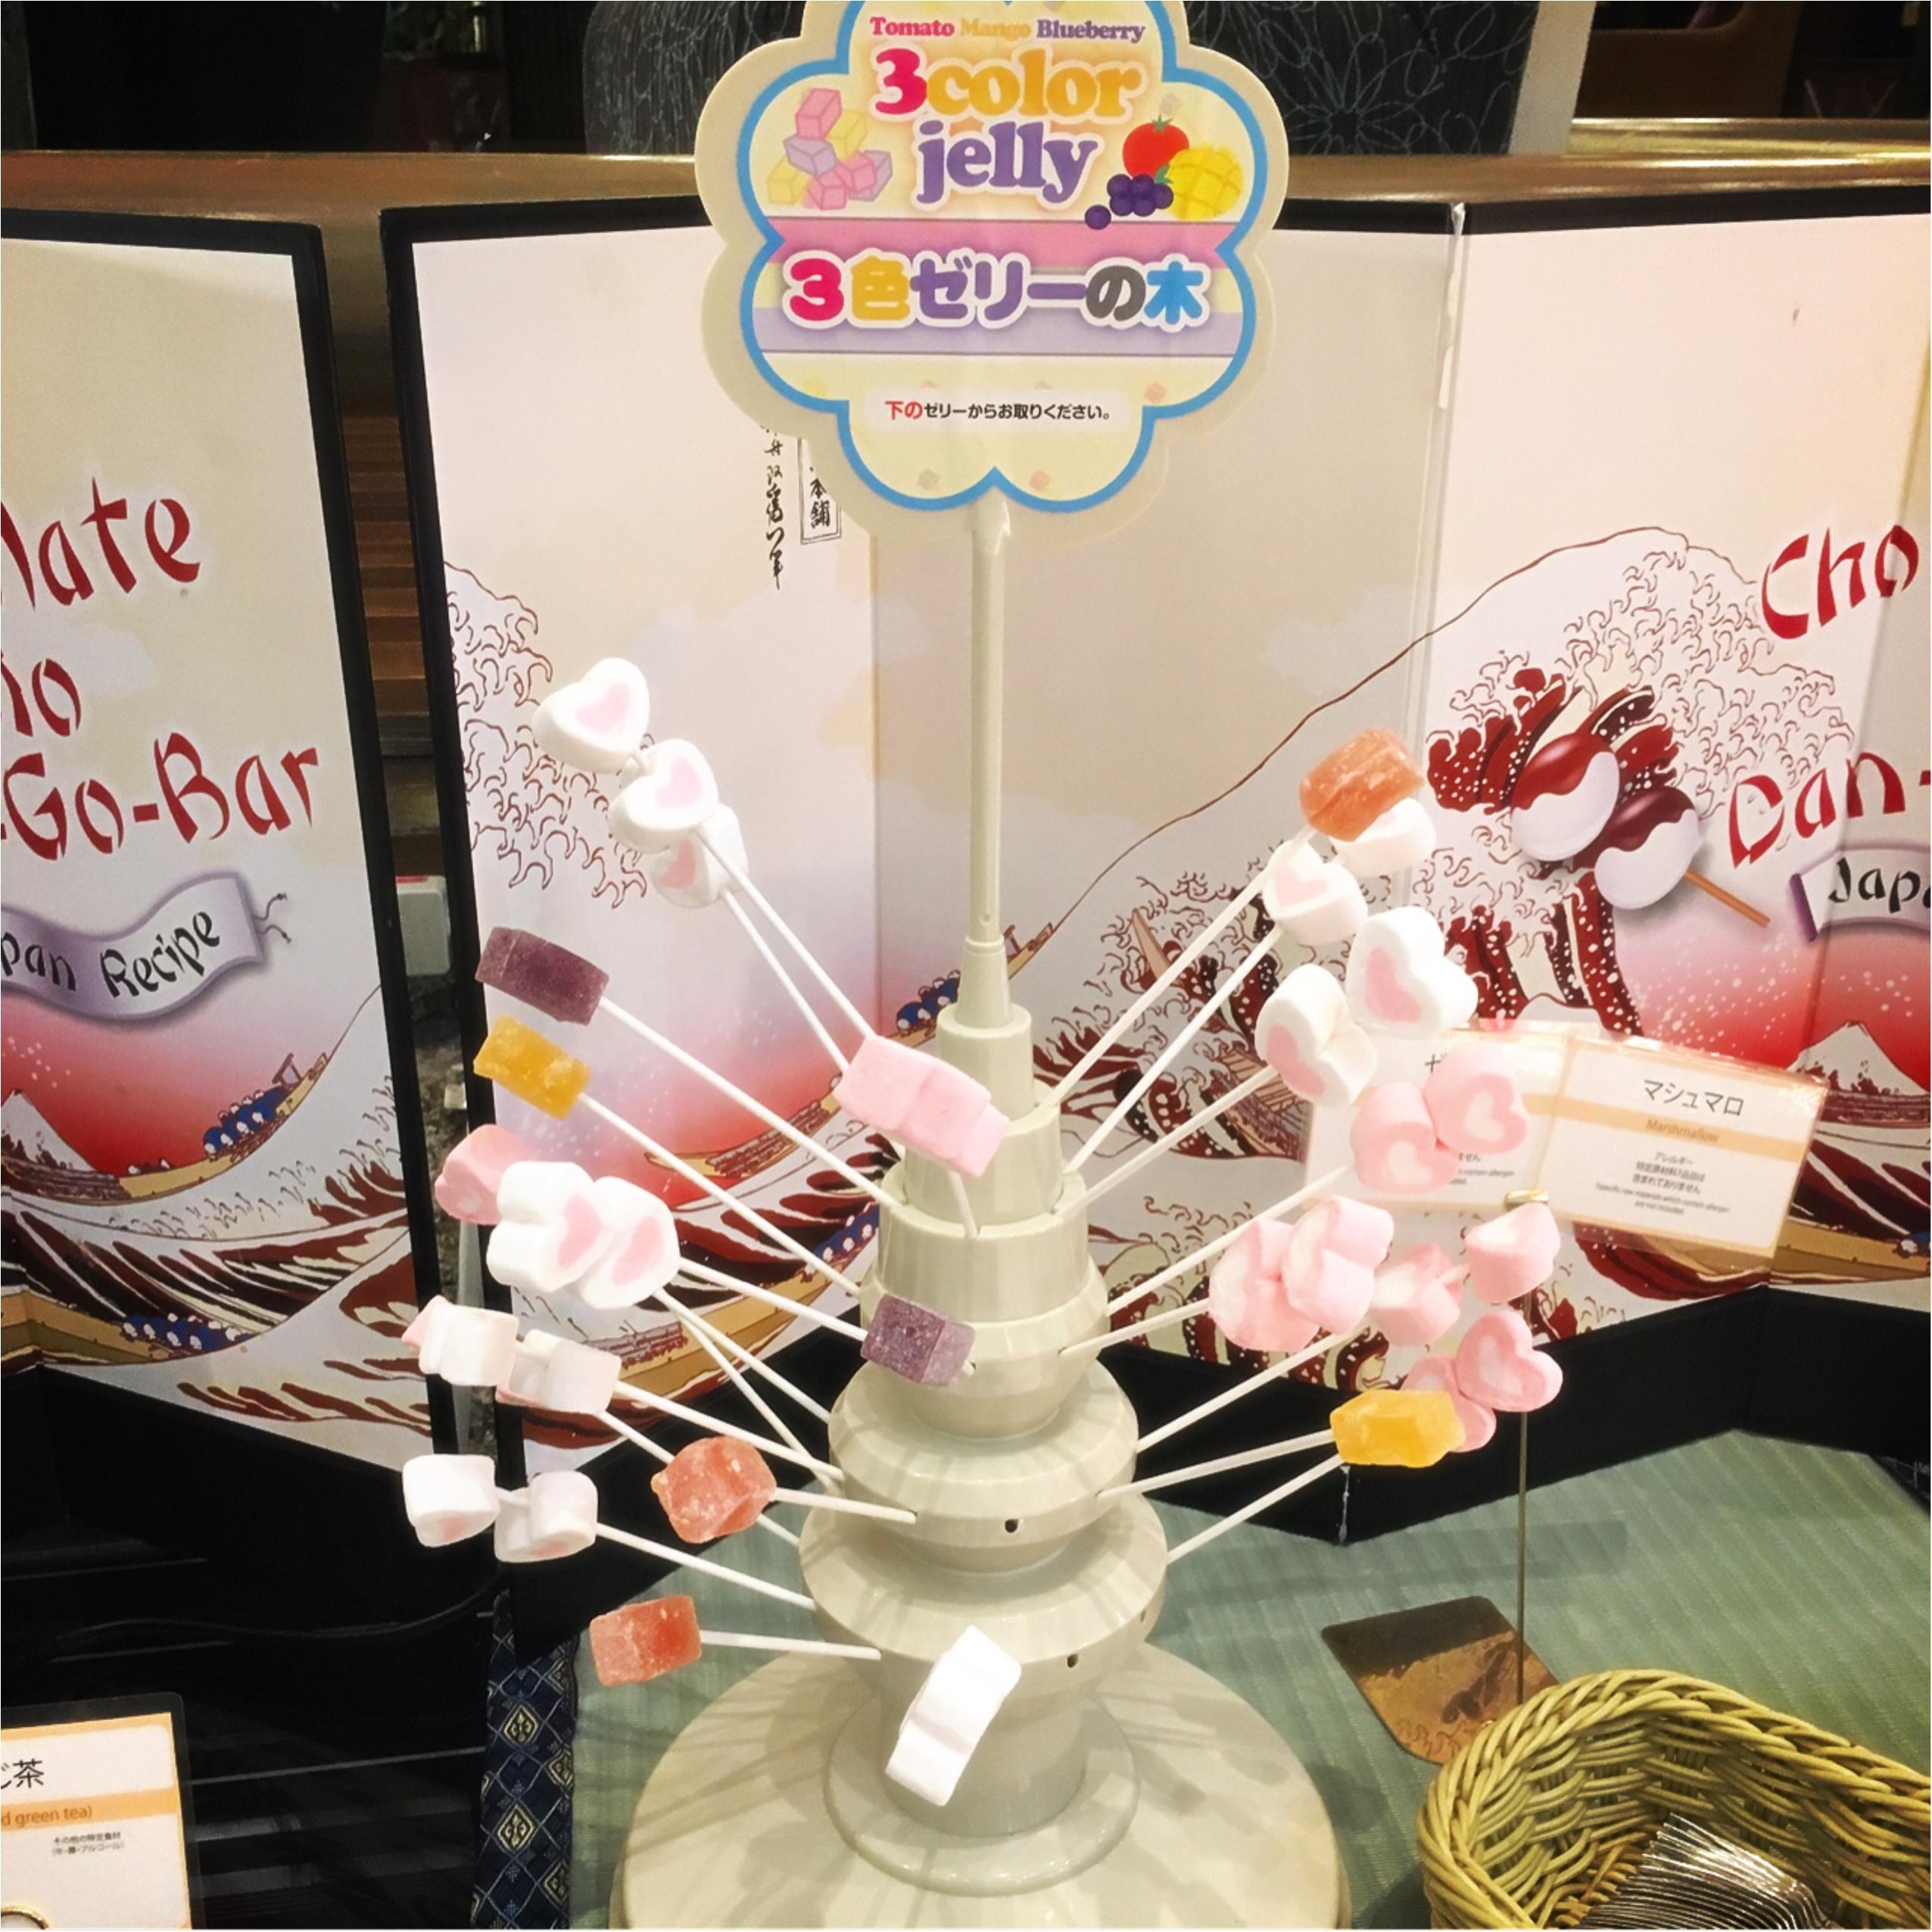 【DINNER】いまお得なディナーはココ!第一ホテル東京シーフォートへ行ってきました☆_9